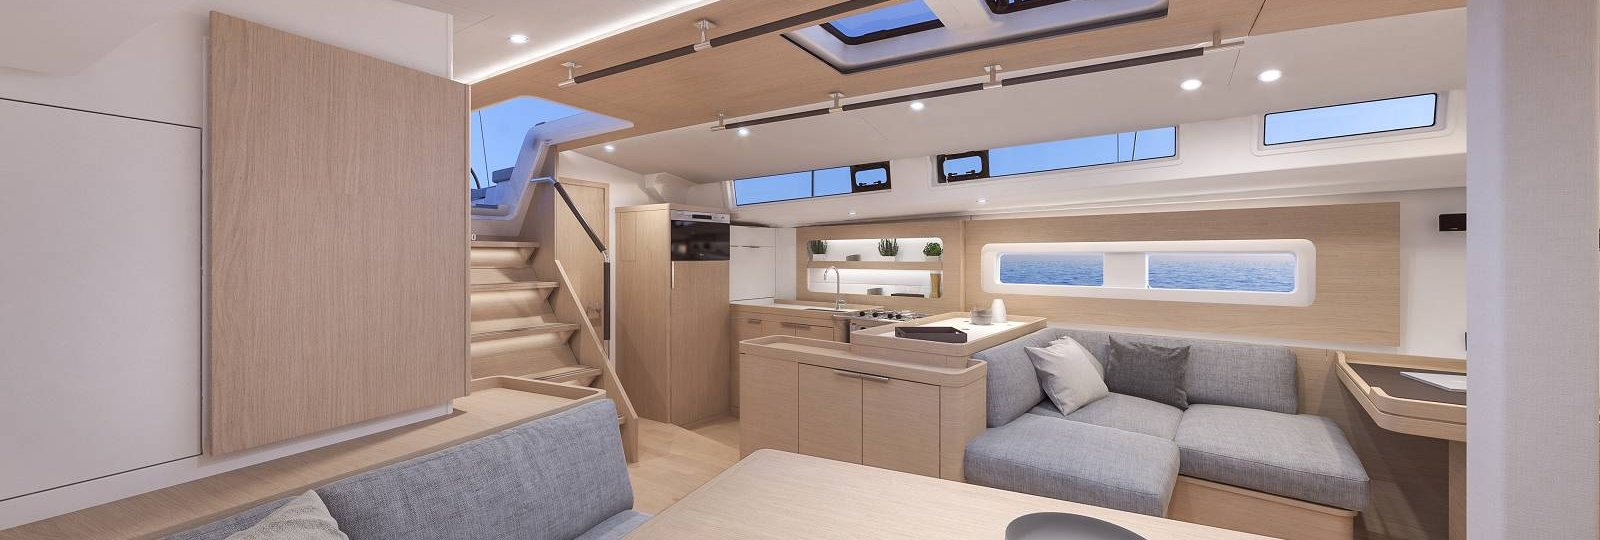 Beneteau Oceanis Yacht 54 saloon